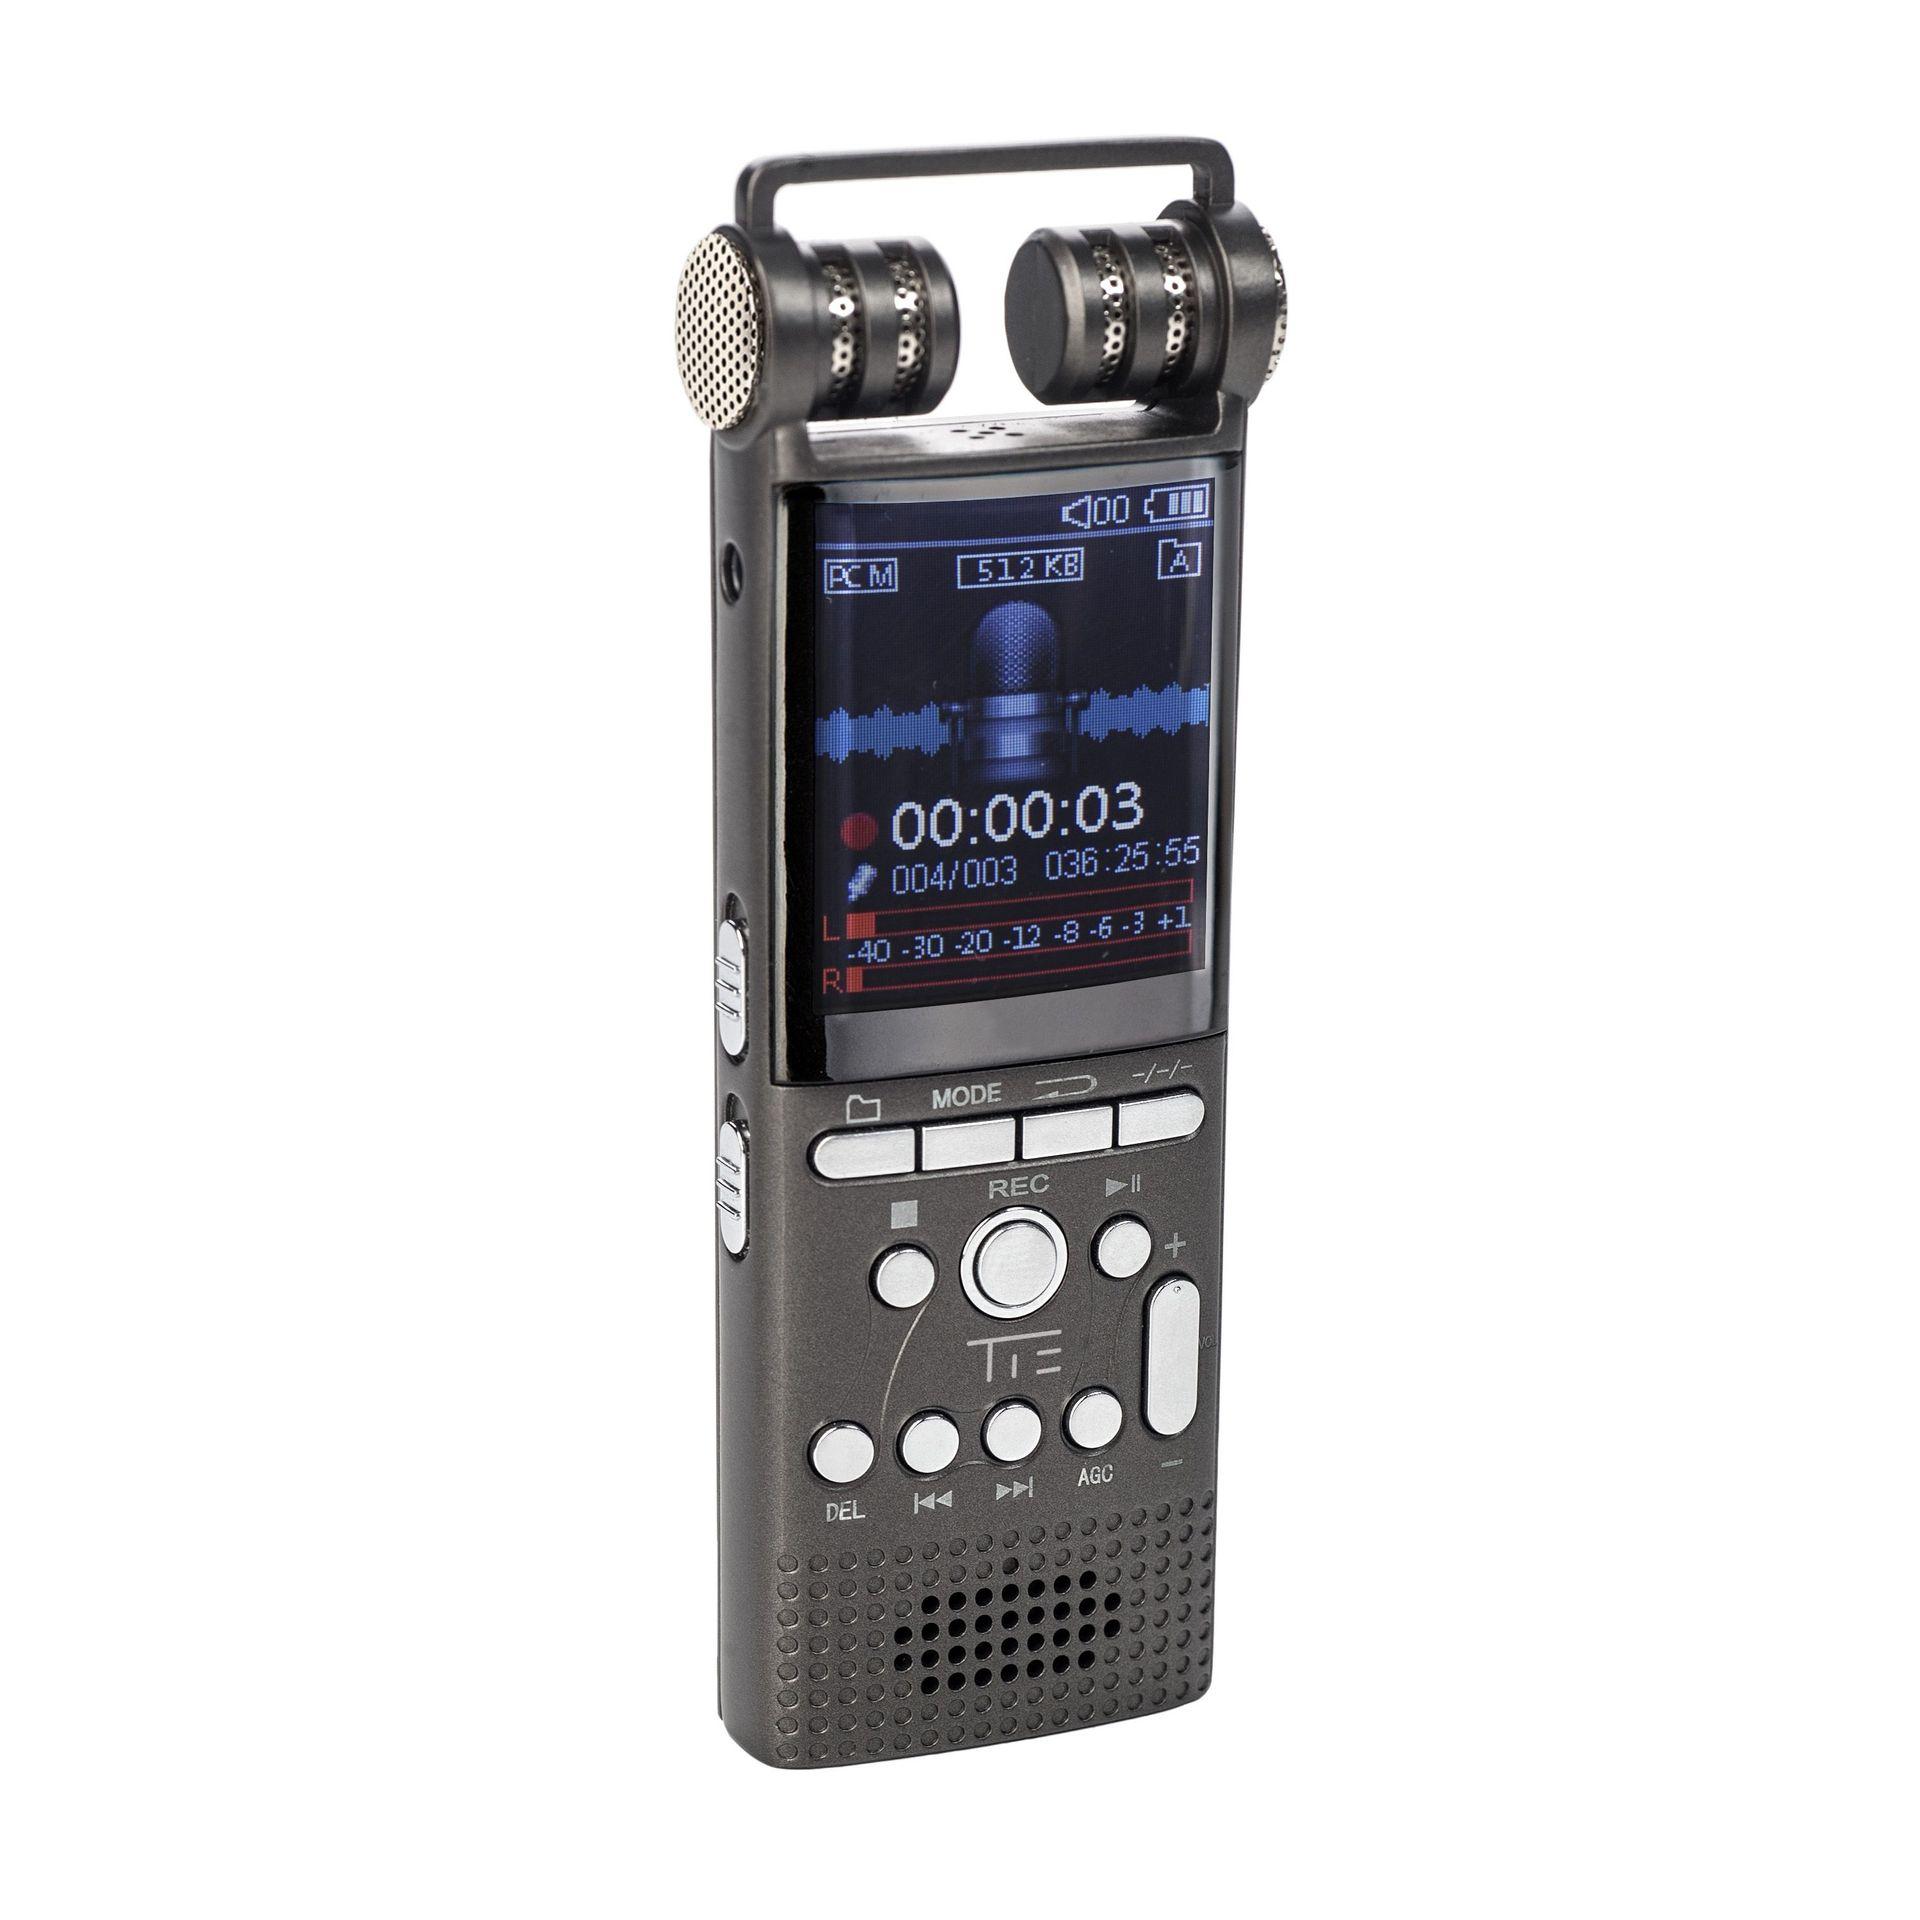 TIE Mobile Digitalrecoder Handyrecorder mit Metallgehäuse inkl. Lavaliermikrofon